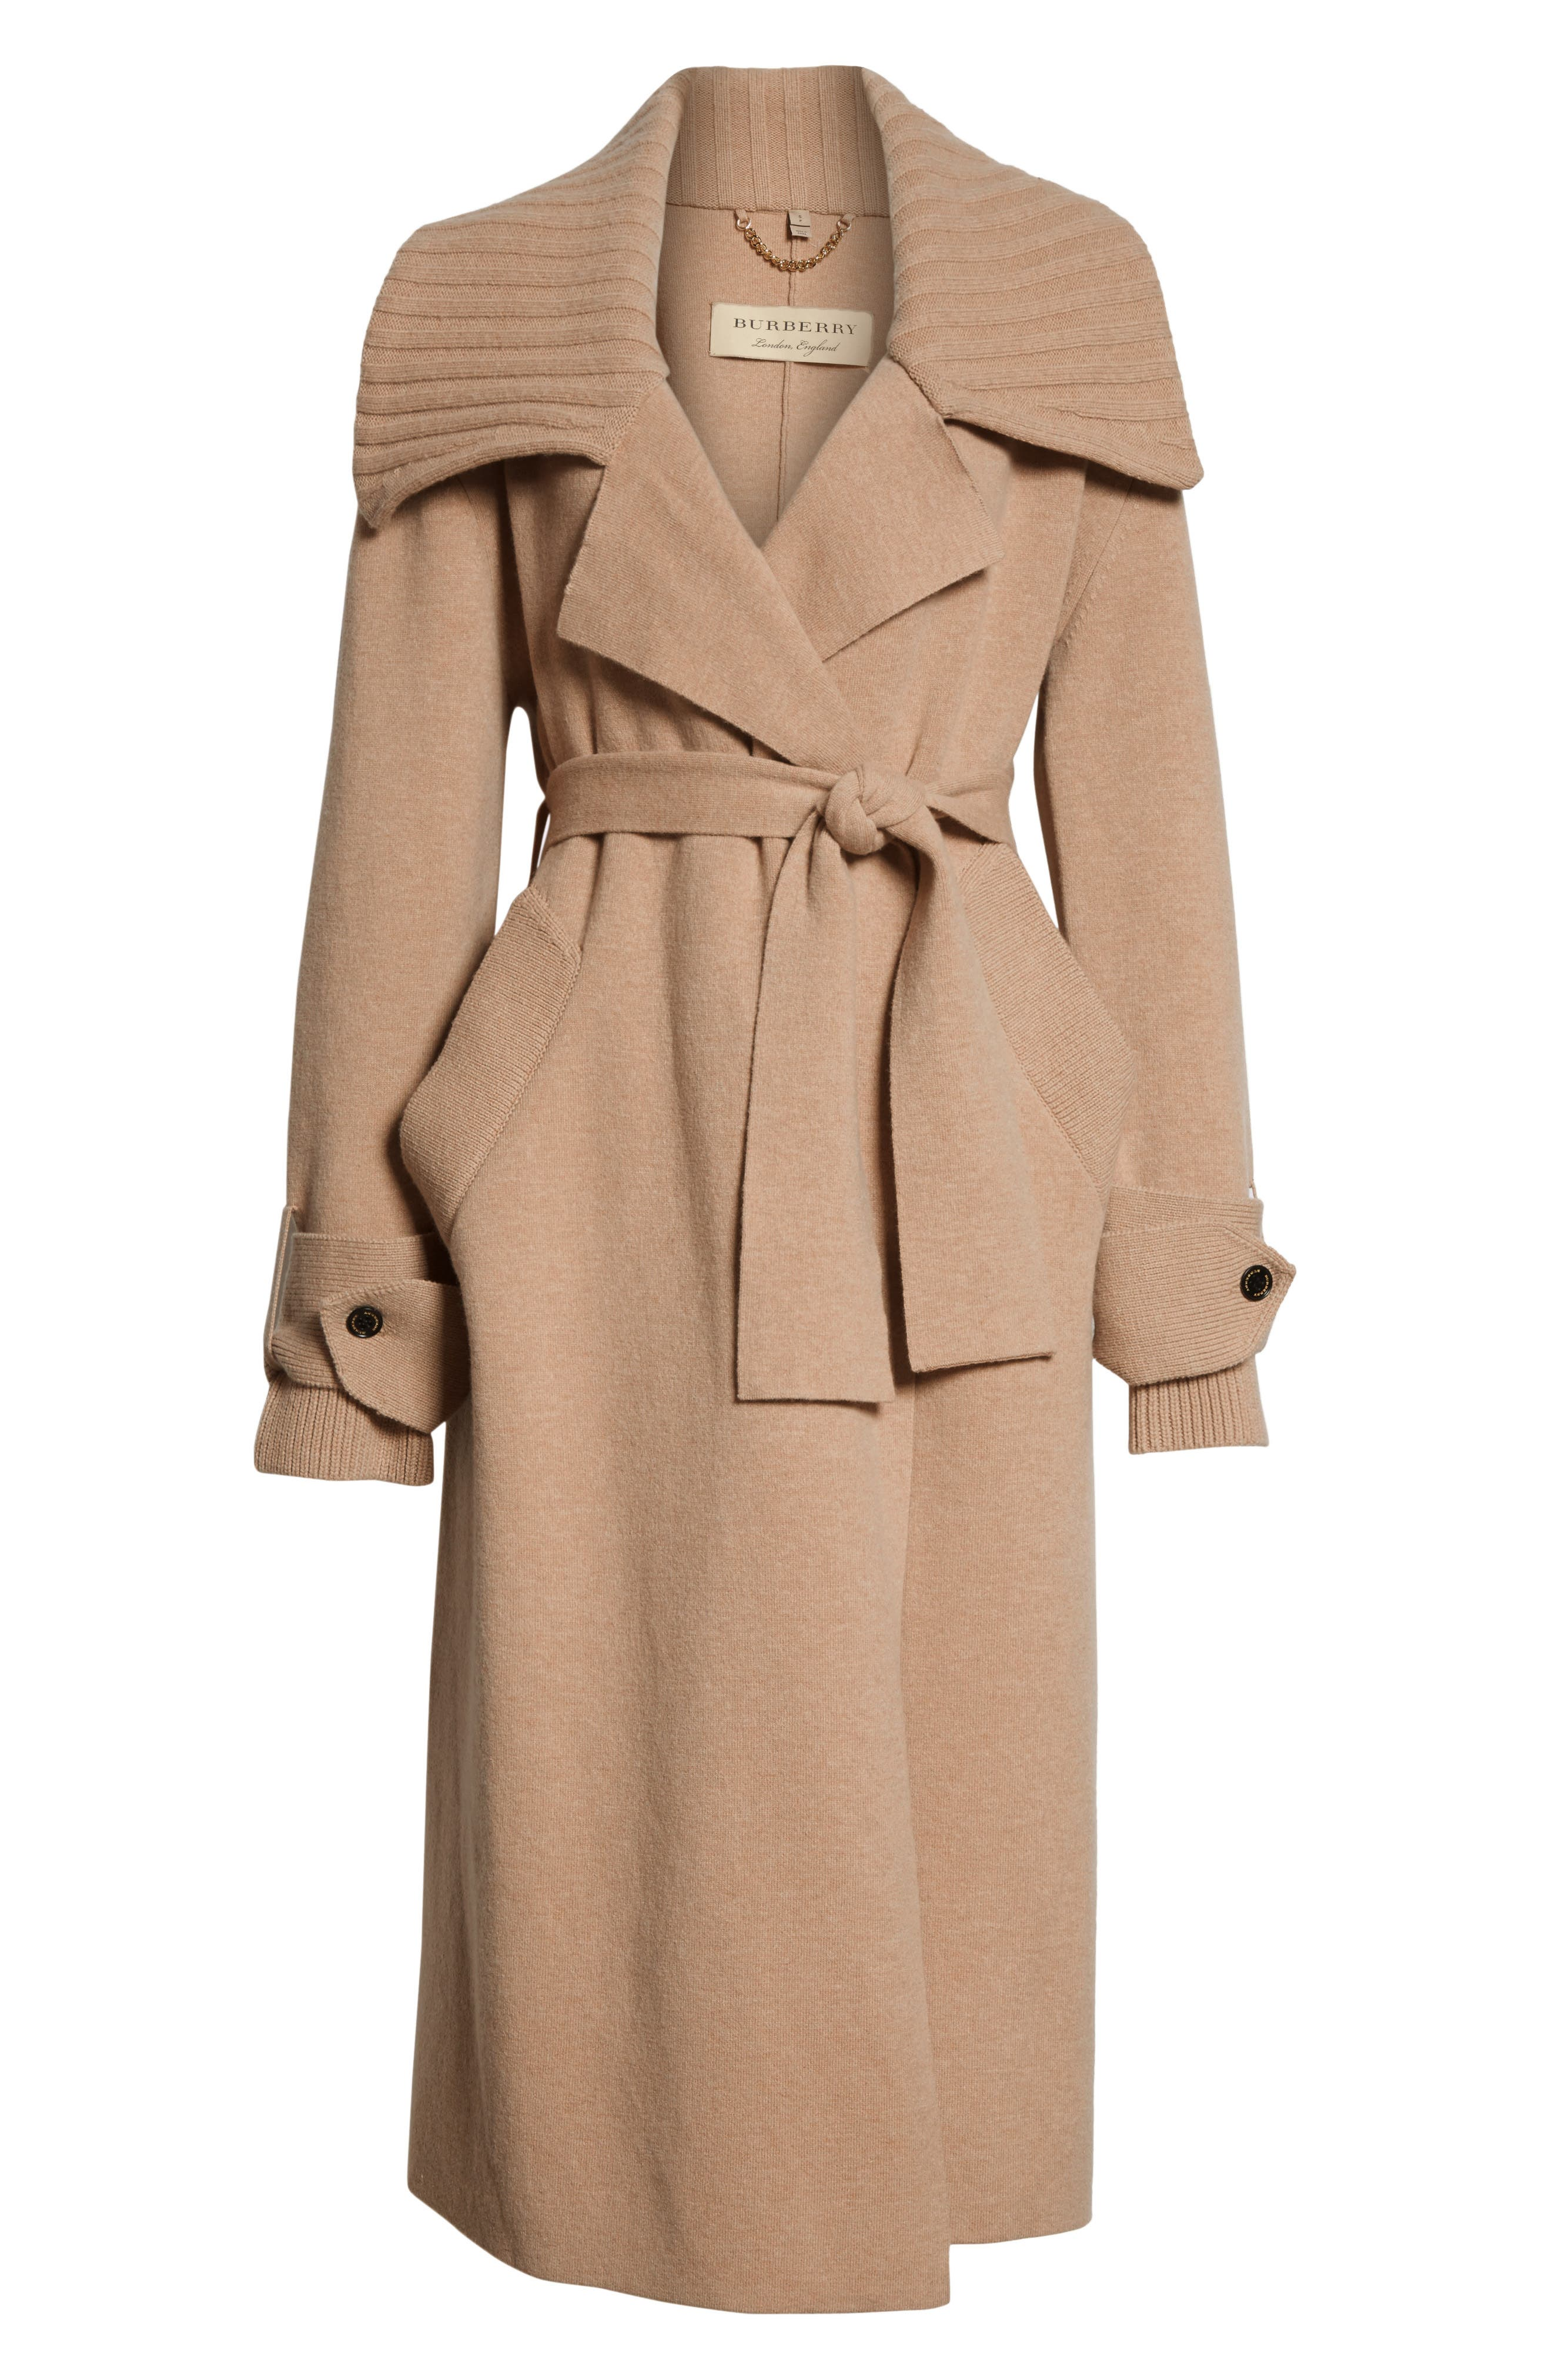 Piota Wool Blend Knit Trench Coat,                             Alternate thumbnail 5, color,                             231